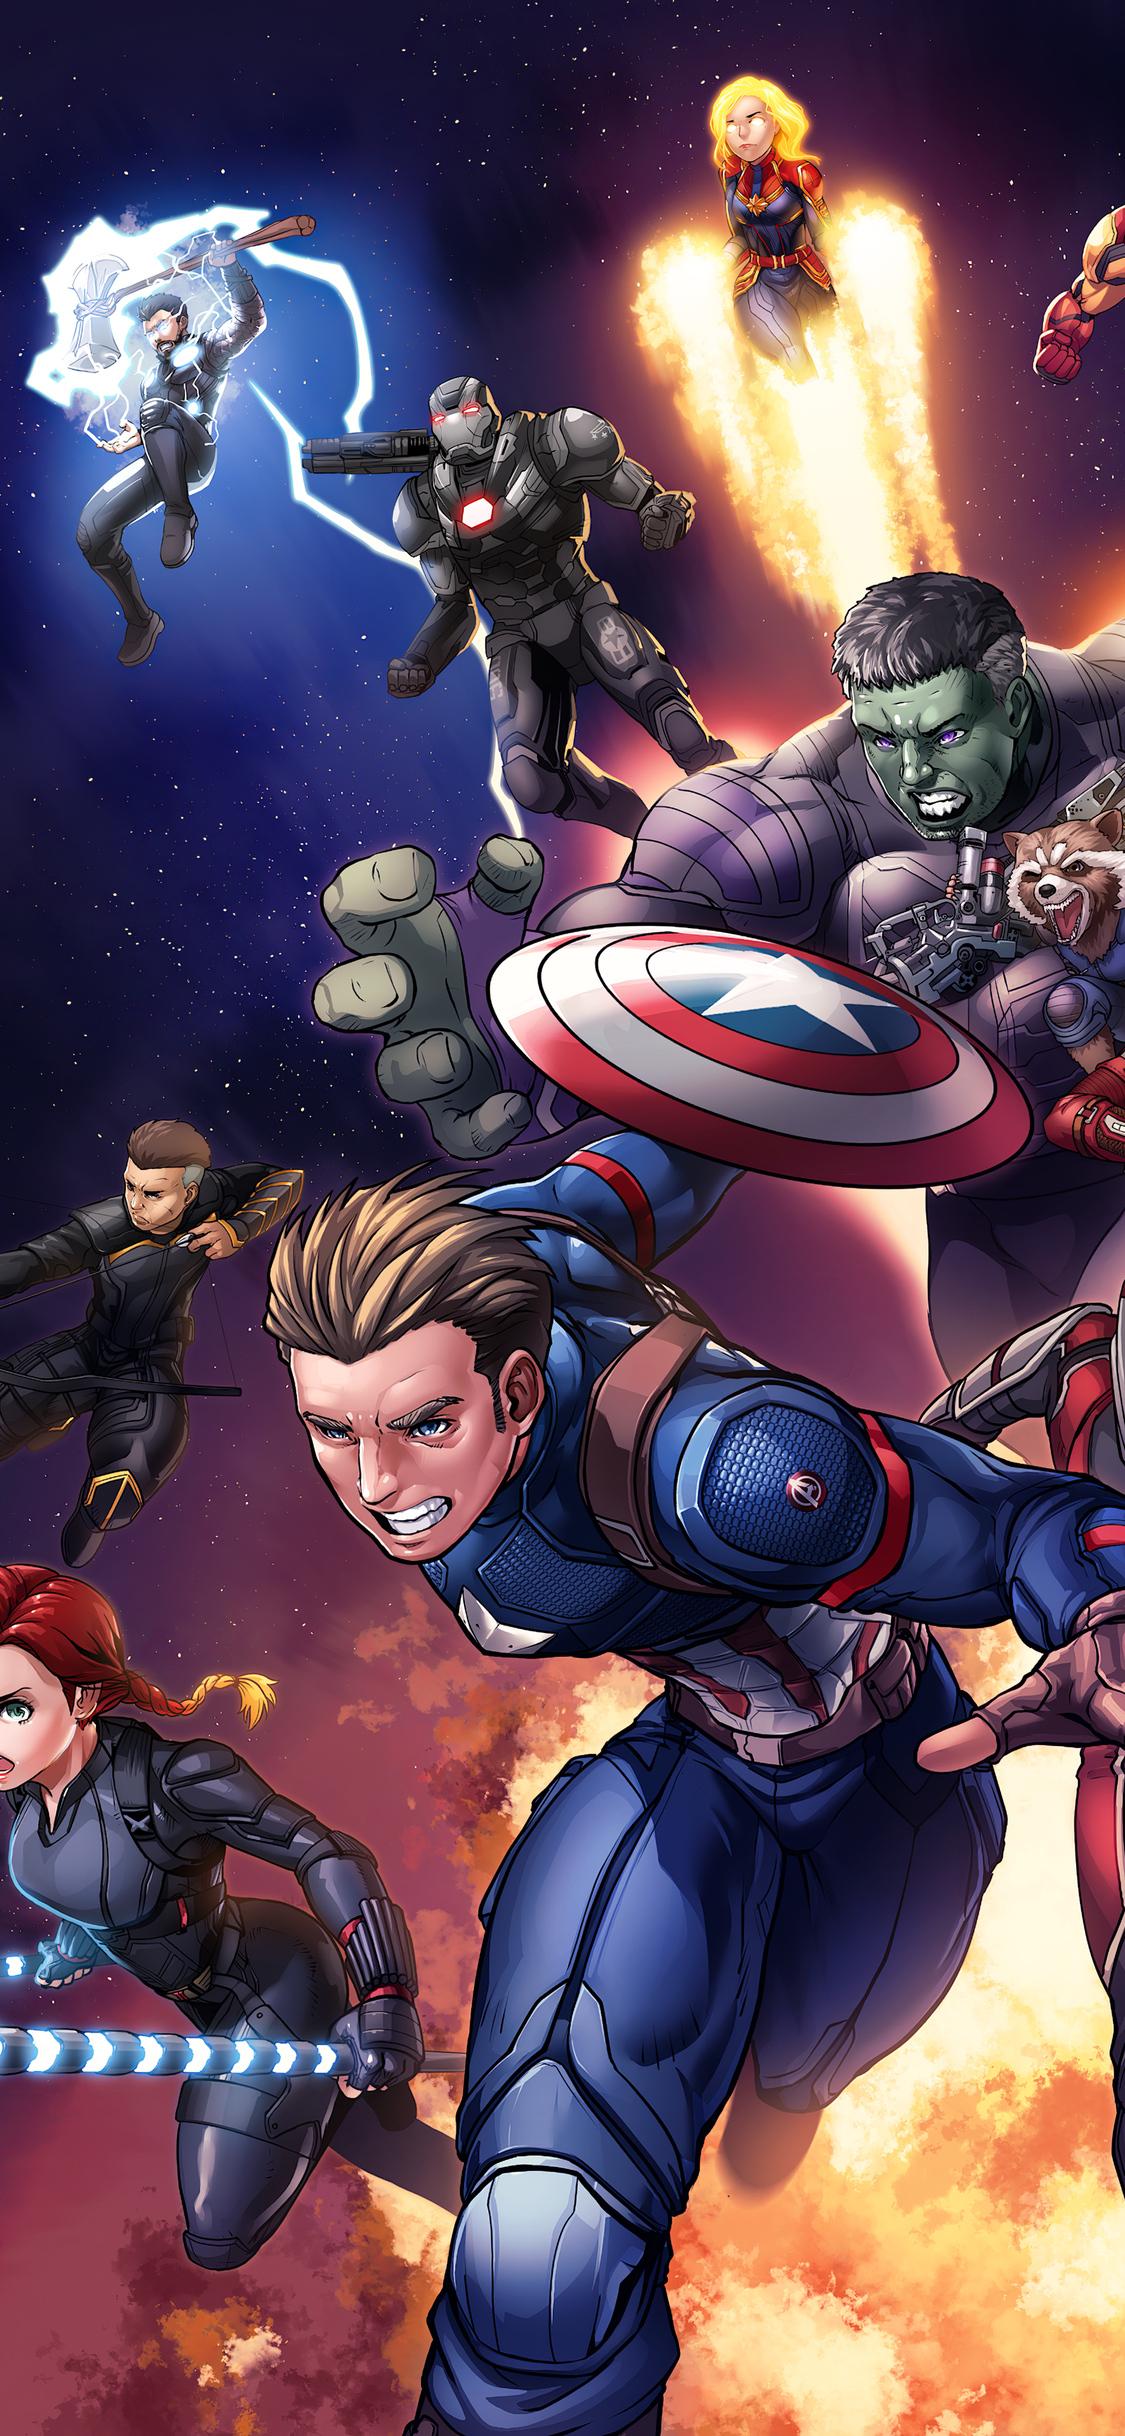 all-heroes-artwork-ku.jpg